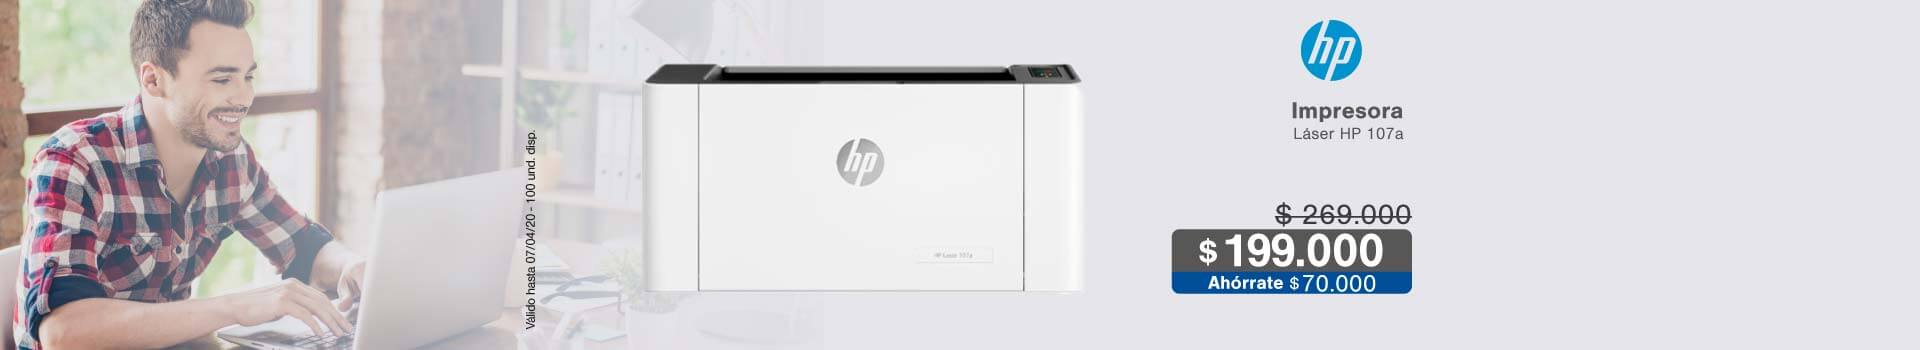 AK-Impresora-HP-107a-Bl-OfCAT-IMPRESION05_abril